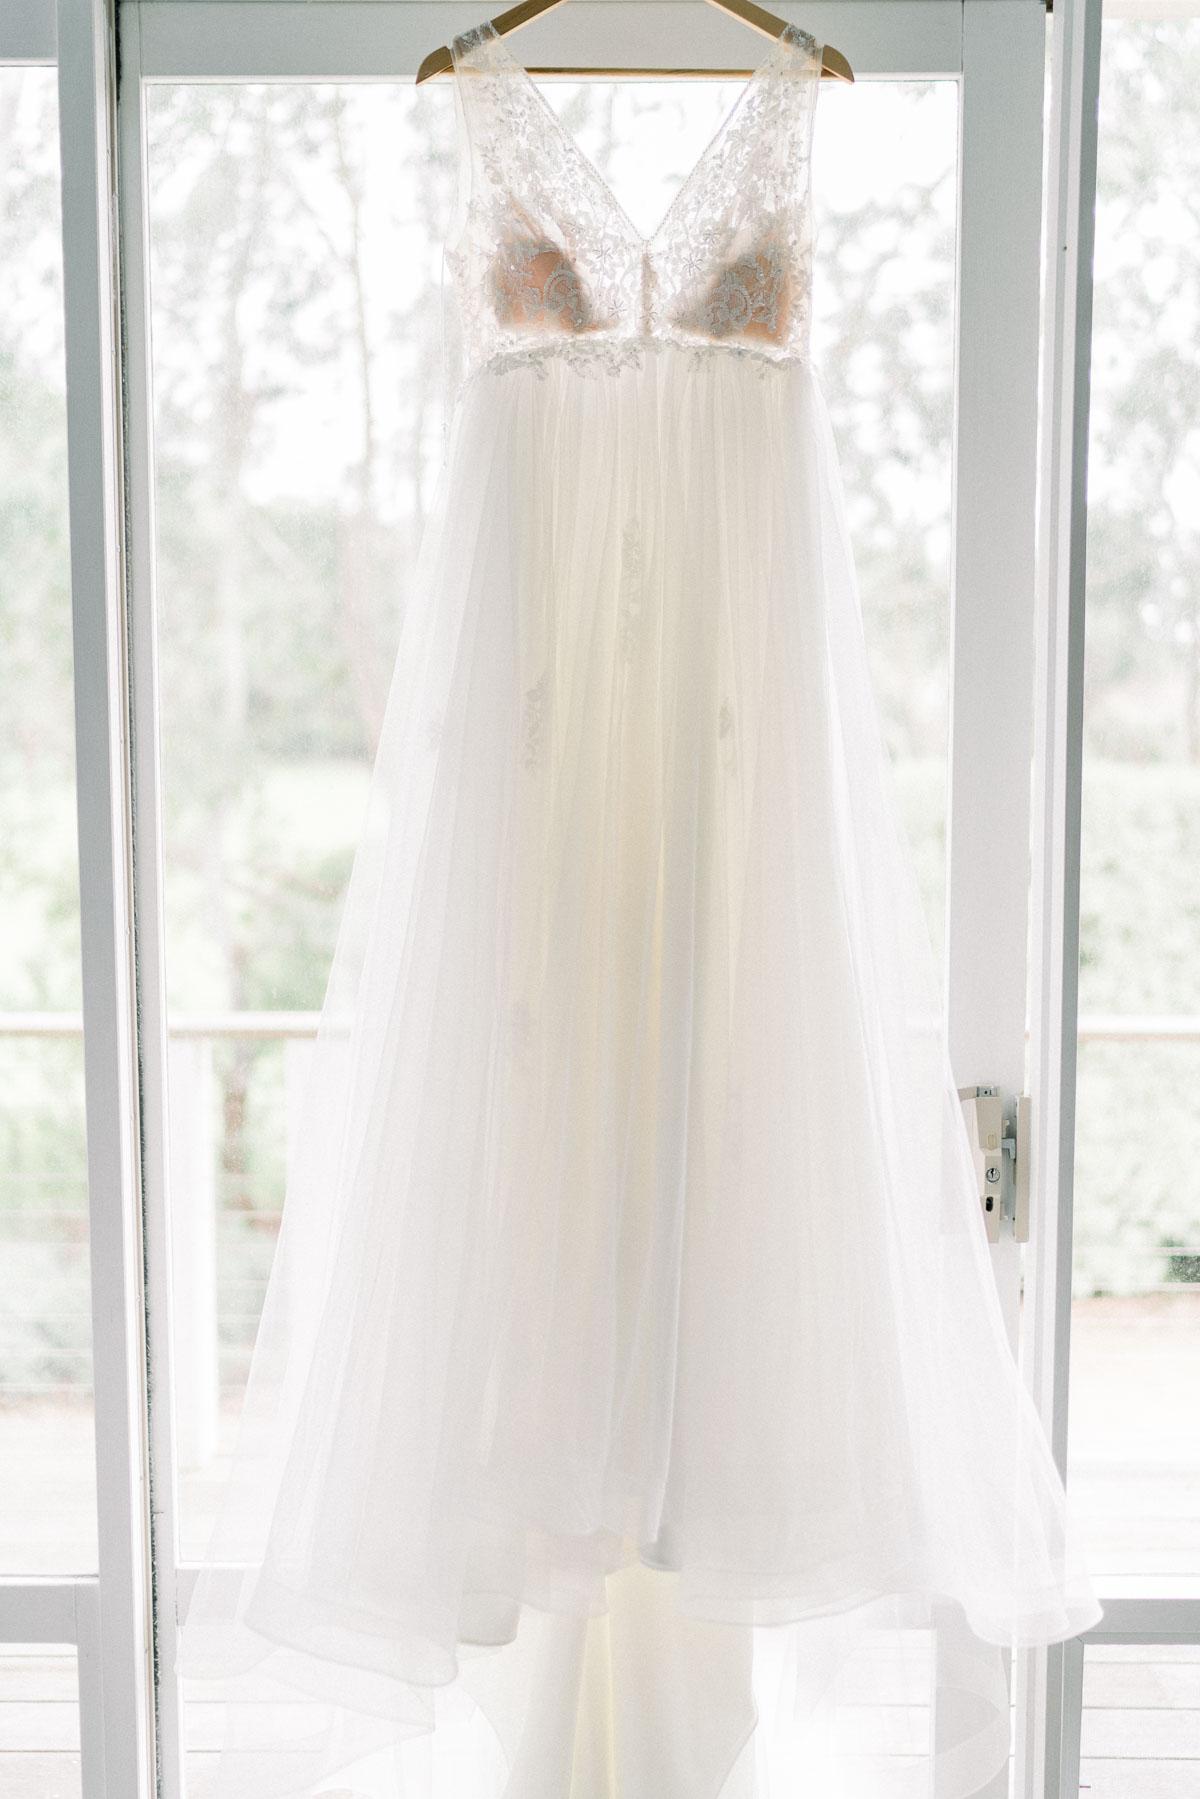 lindenderry-wedding-heart+soul-weddings-amy-alain-02889.jpg